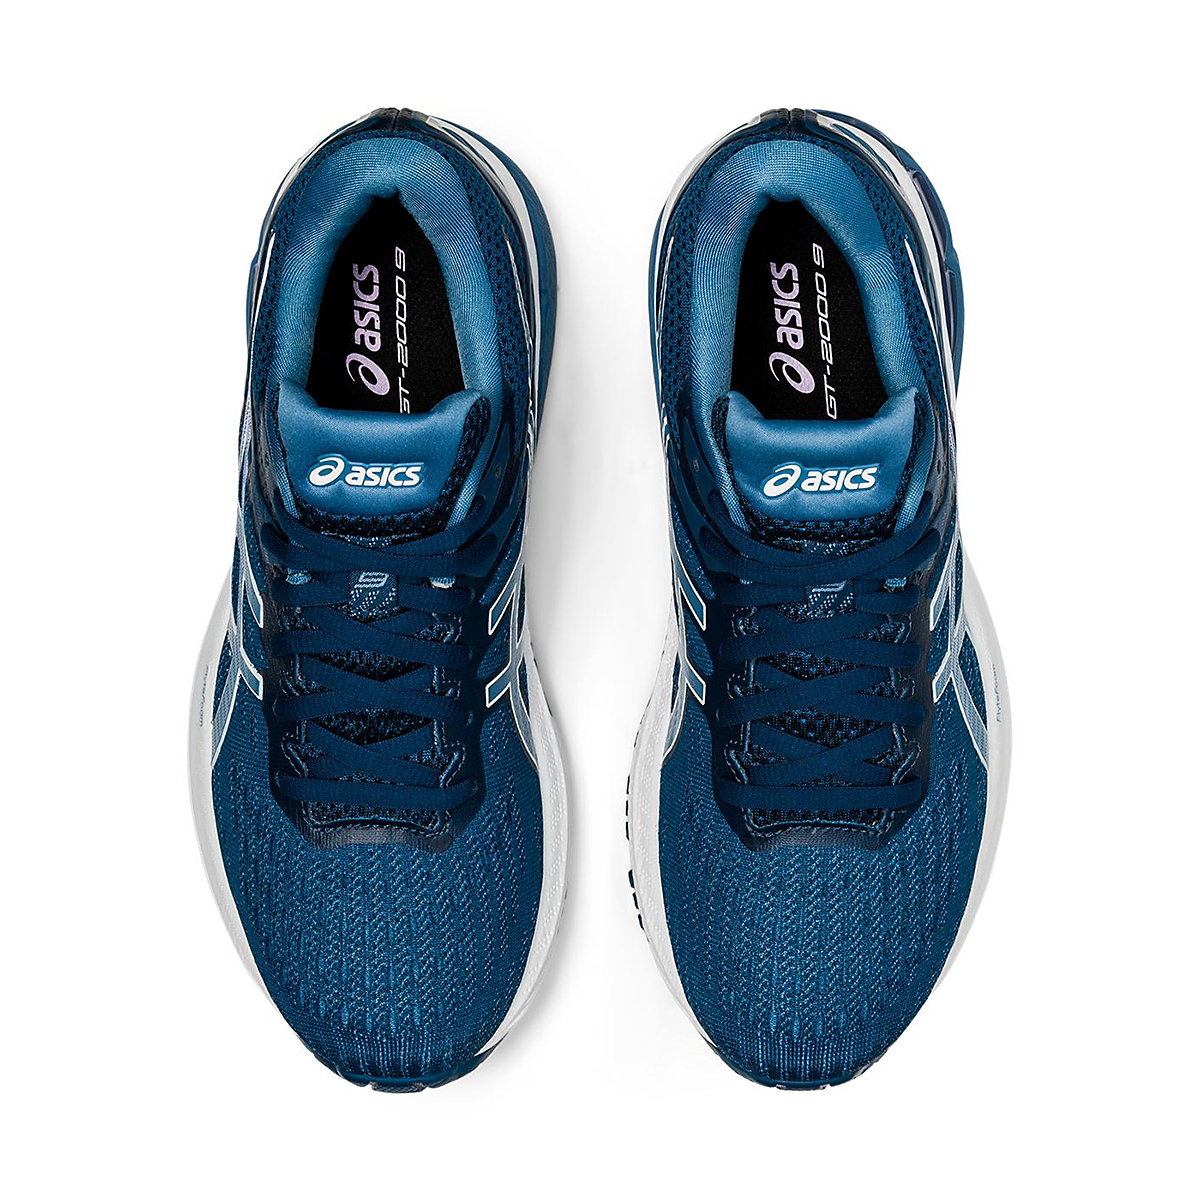 Women's Asics Gt-2000 9 Running Shoe - Color: Mako Blue/Grey - Size: 6 - Width: Wide, Mako Blue/Grey, large, image 3